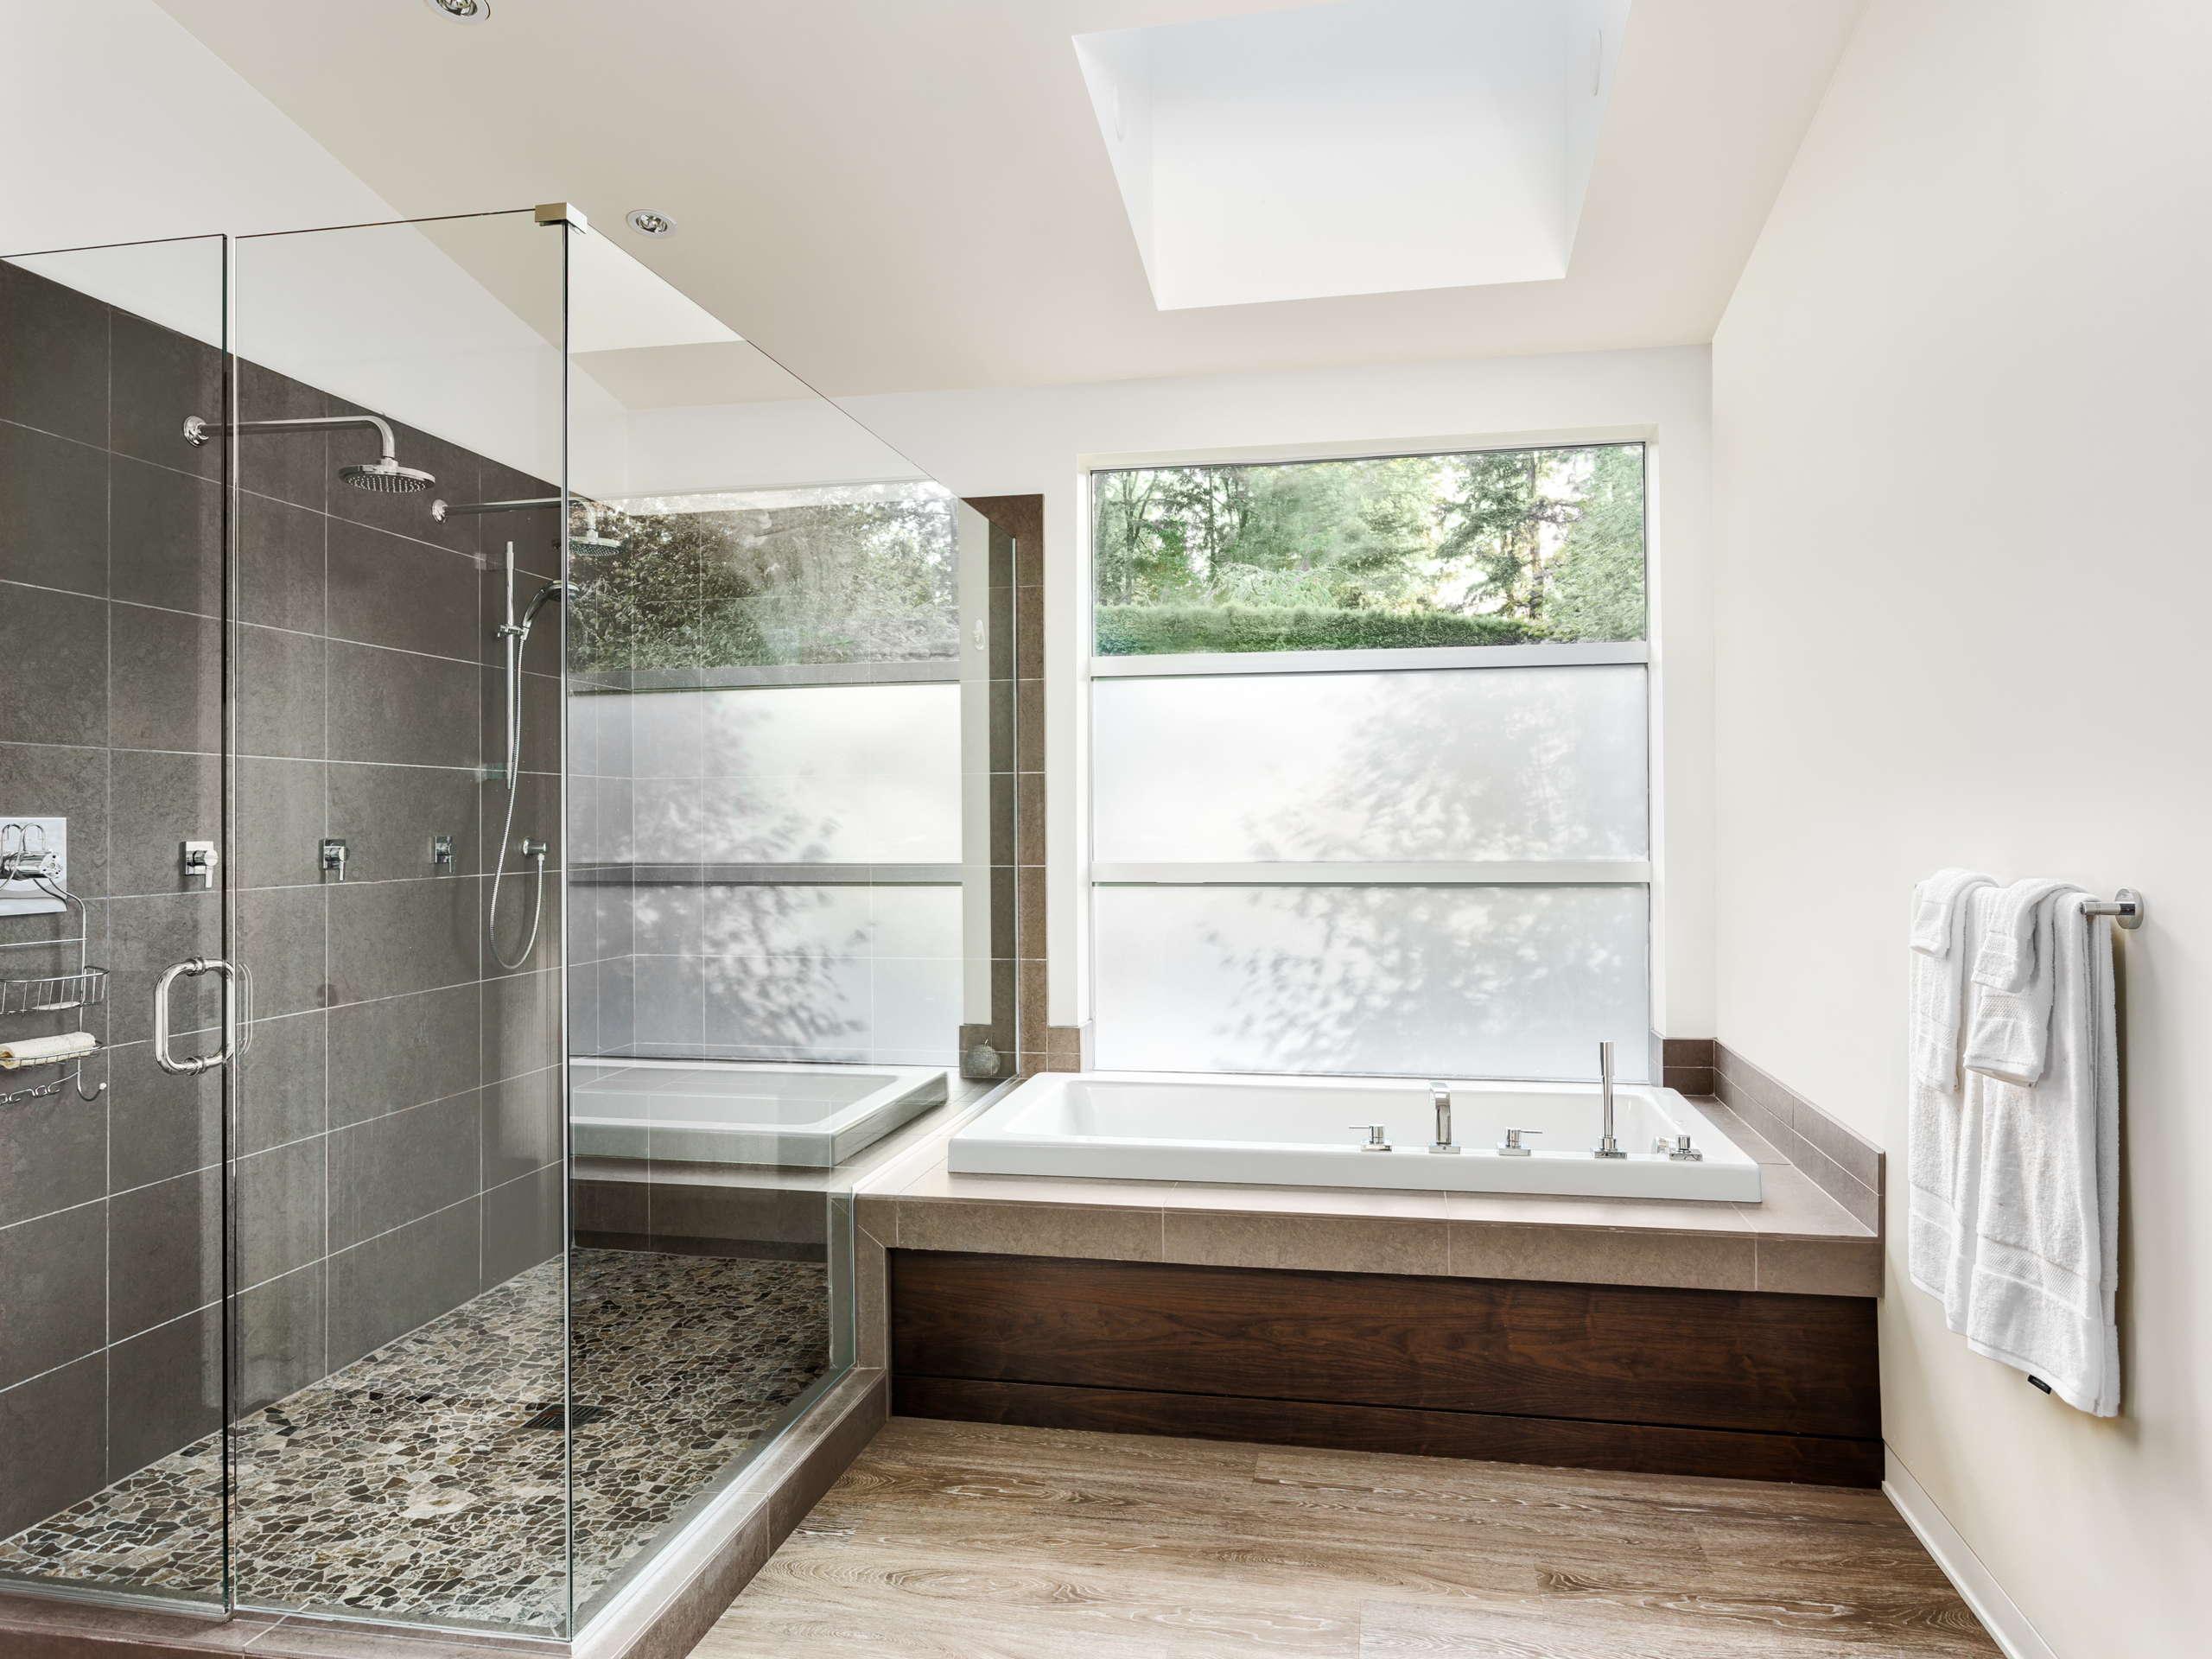 https://americanexpress-construction.com/wp-content/uploads/2015/05/bathroomremodel2.jpg